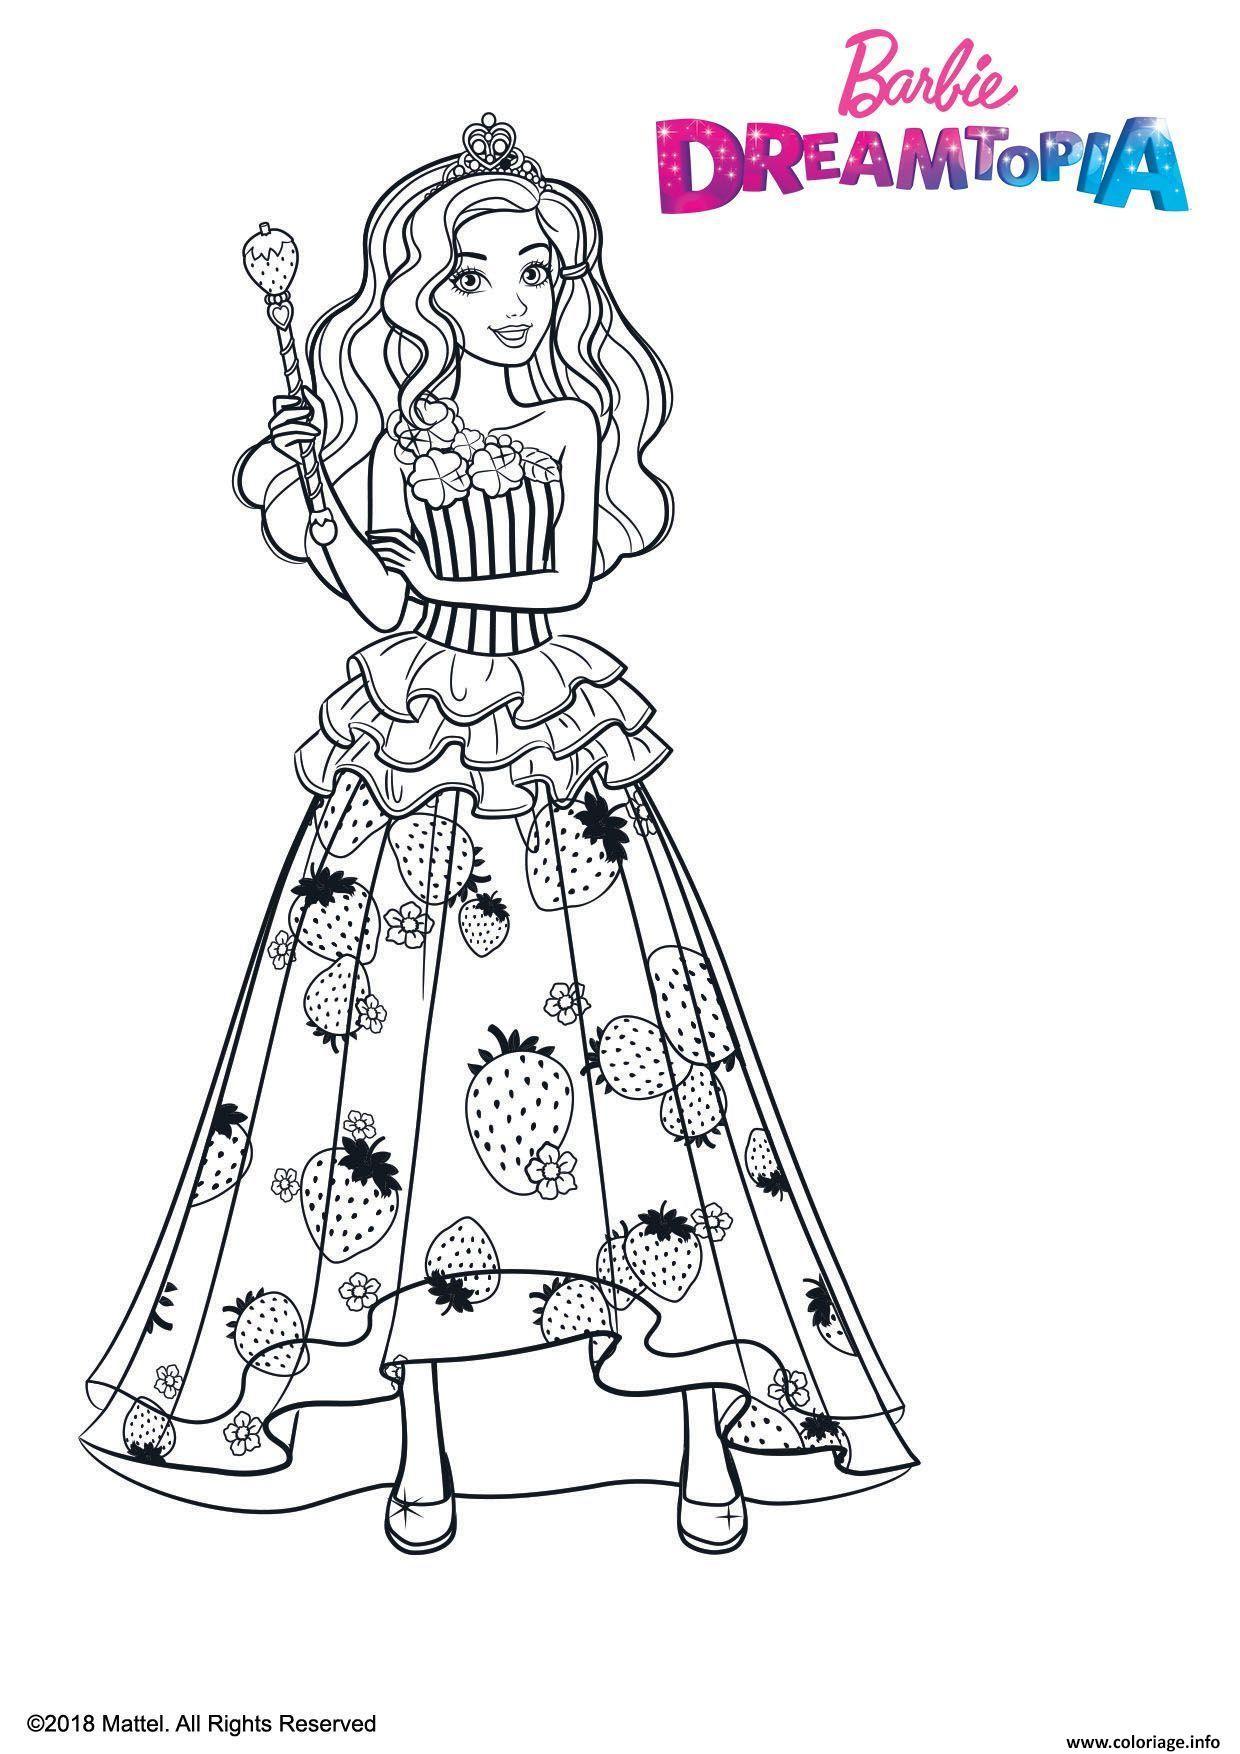 Coloriage Barbie Princesse Bonbons Dessin Gulli à imprimer